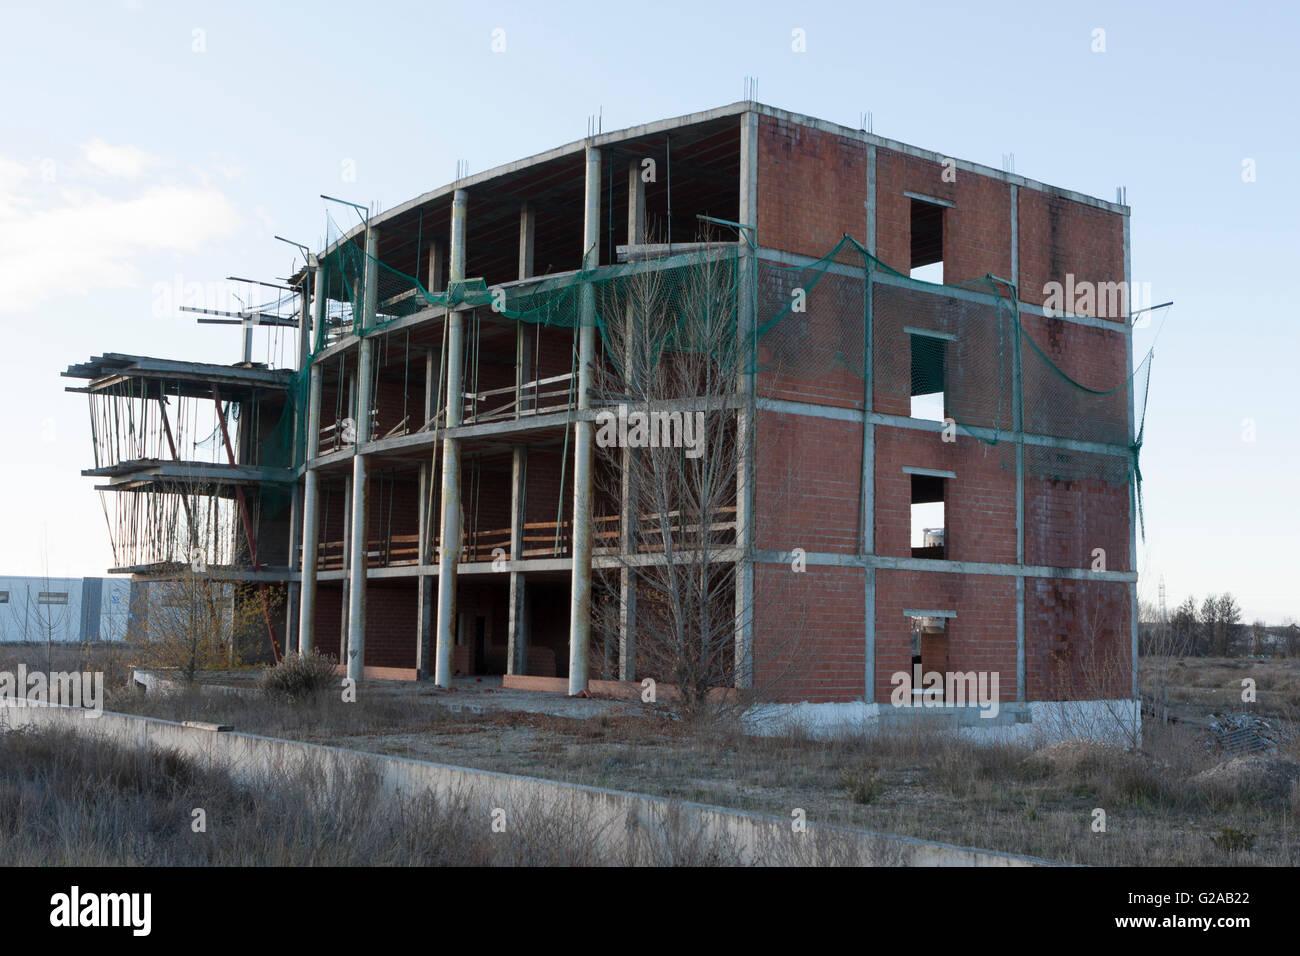 Building construction crisis in Aranda del Duero, Burgos. Spain - Stock Image